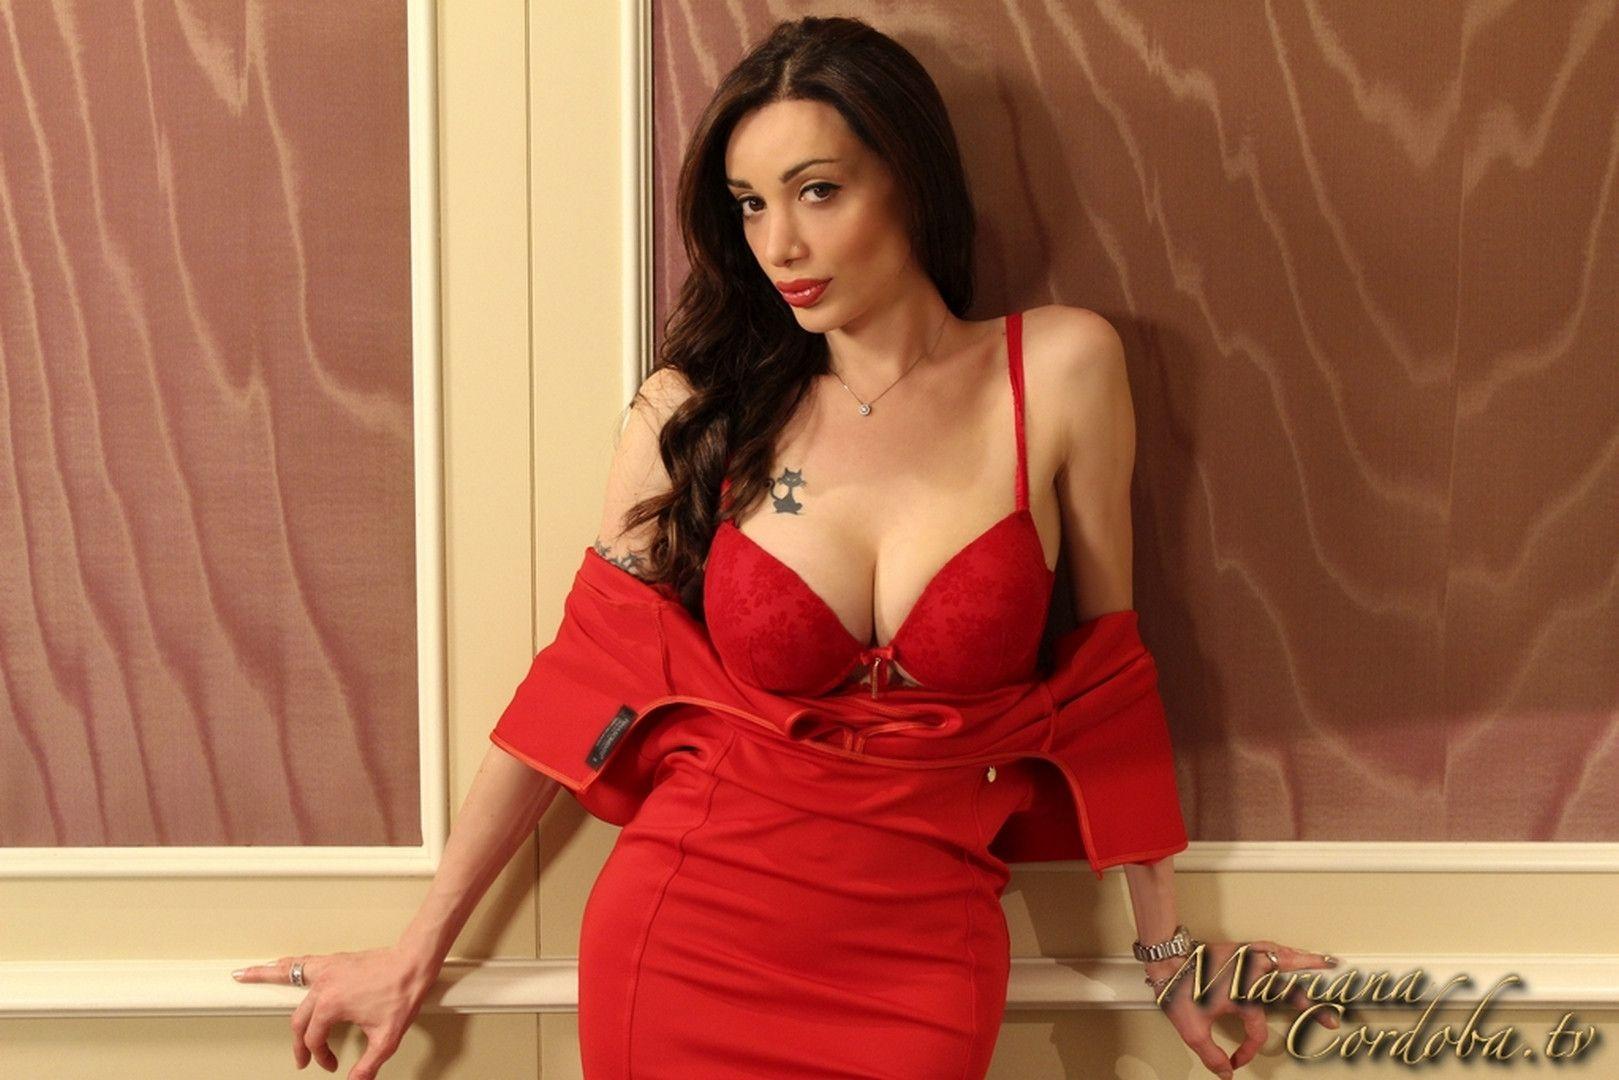 Marianacordoba Red Passion